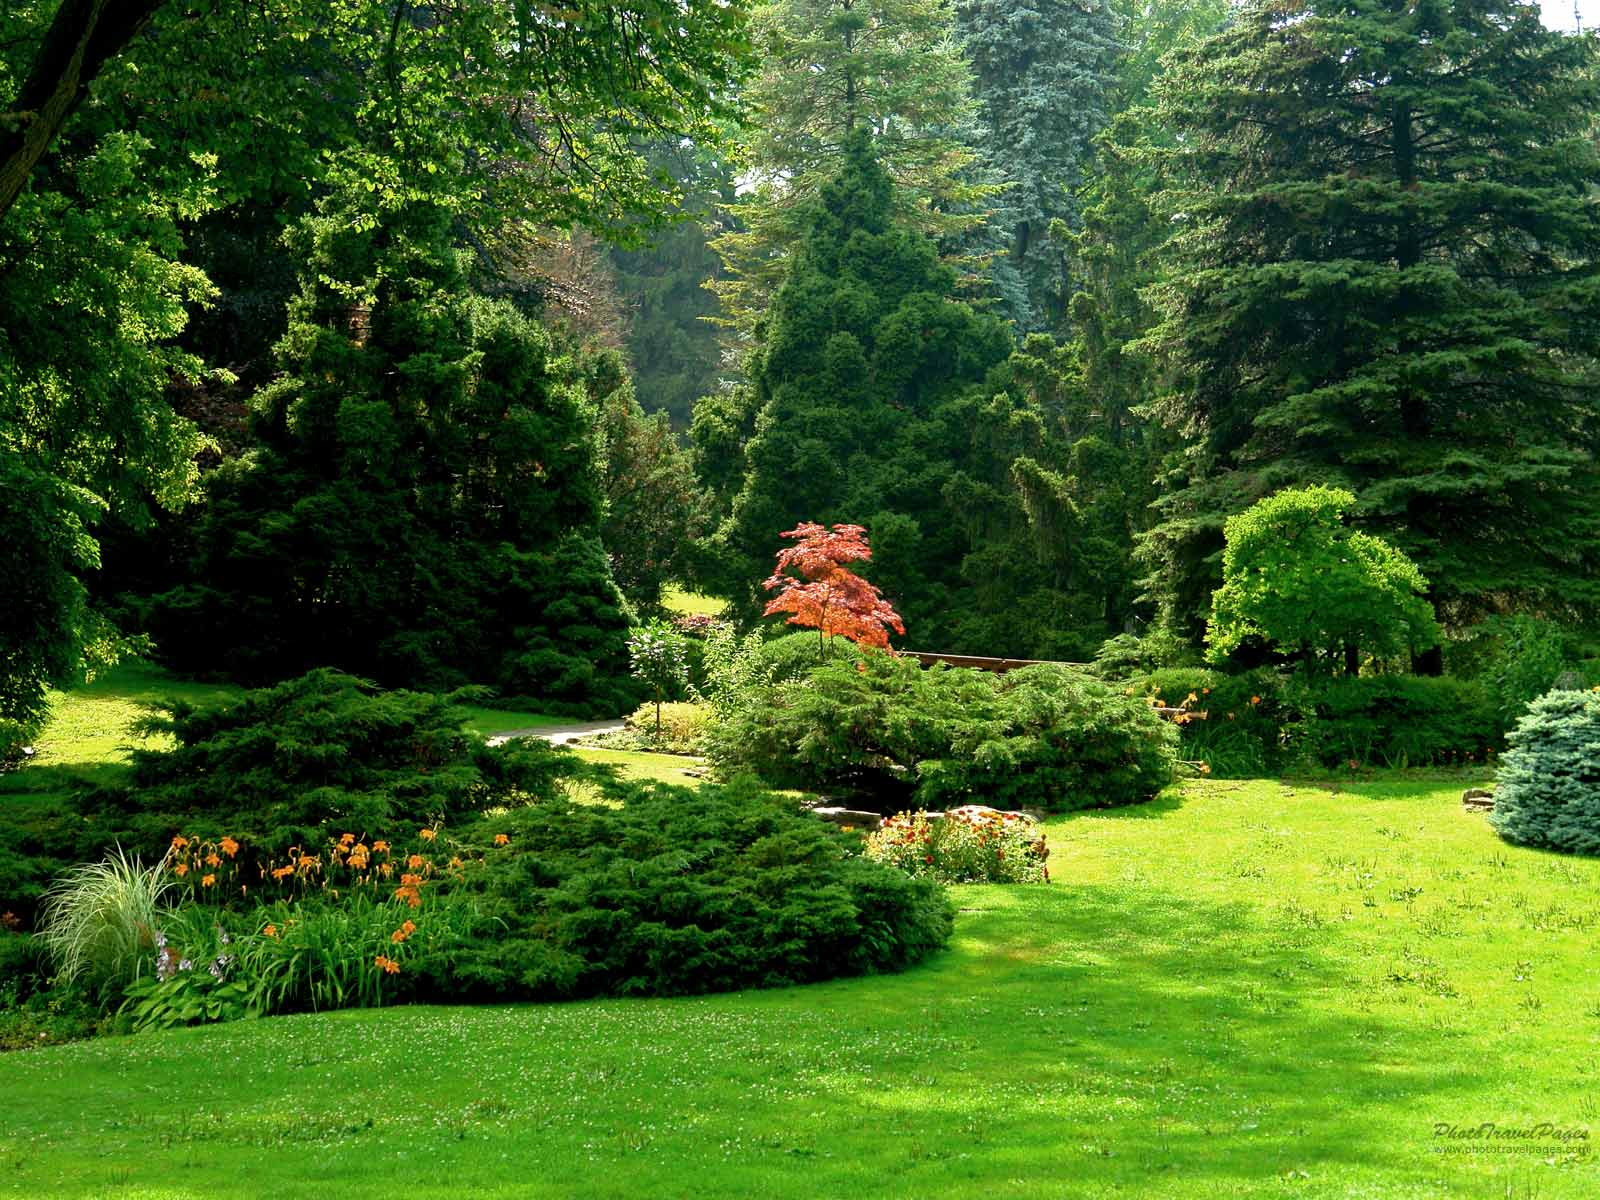 http://3.bp.blogspot.com/-HgBHEvF7vNs/Tbn7QggRfCI/AAAAAAAAAV0/QfGMgZJagc8/s1600/suny+garden+%25283%2529.jpg